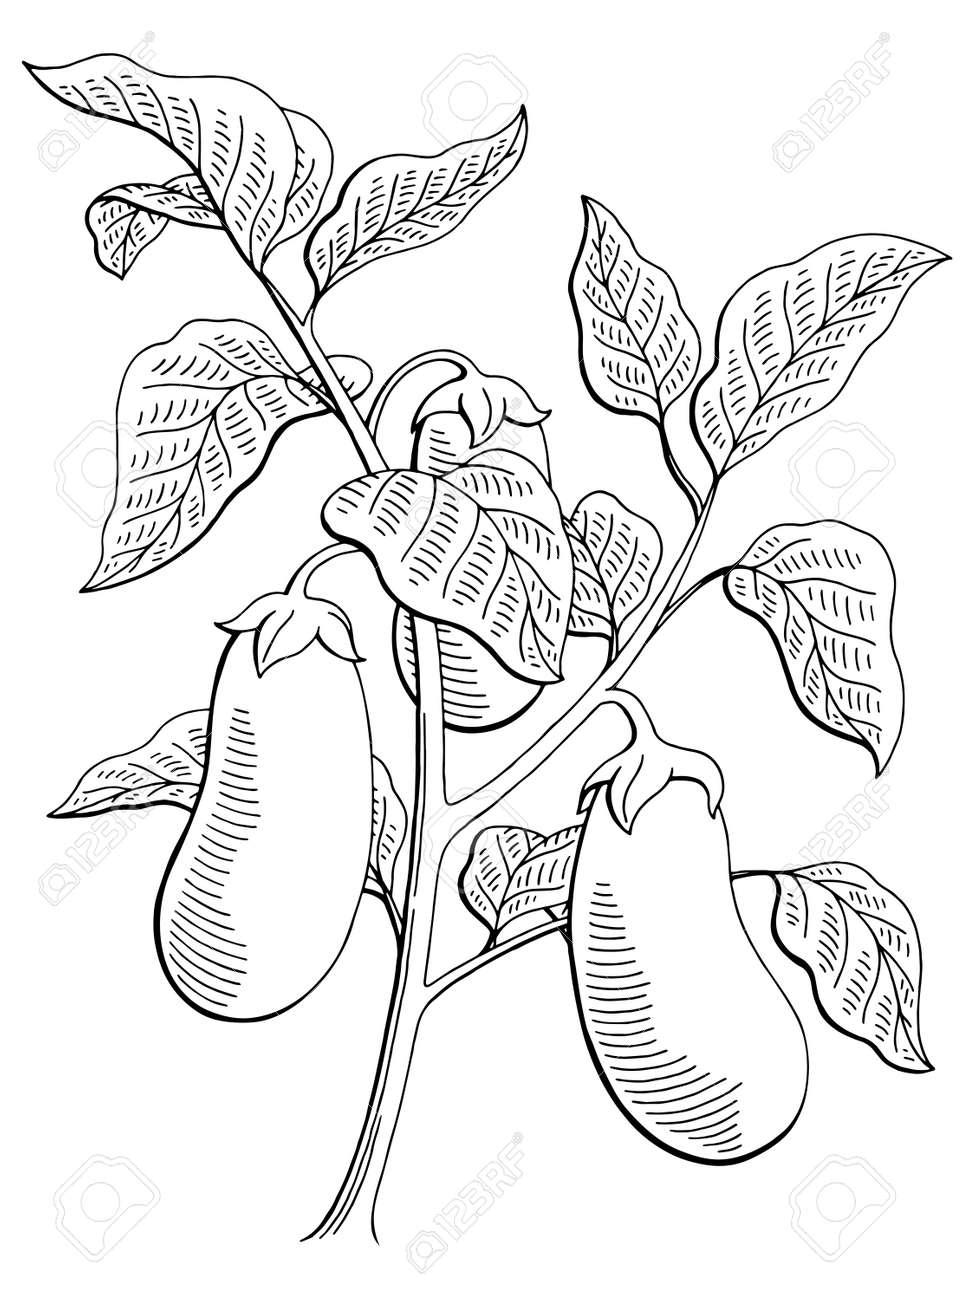 Eggplant Graphic Bush Plant Black White Isolated Sketch Illustration